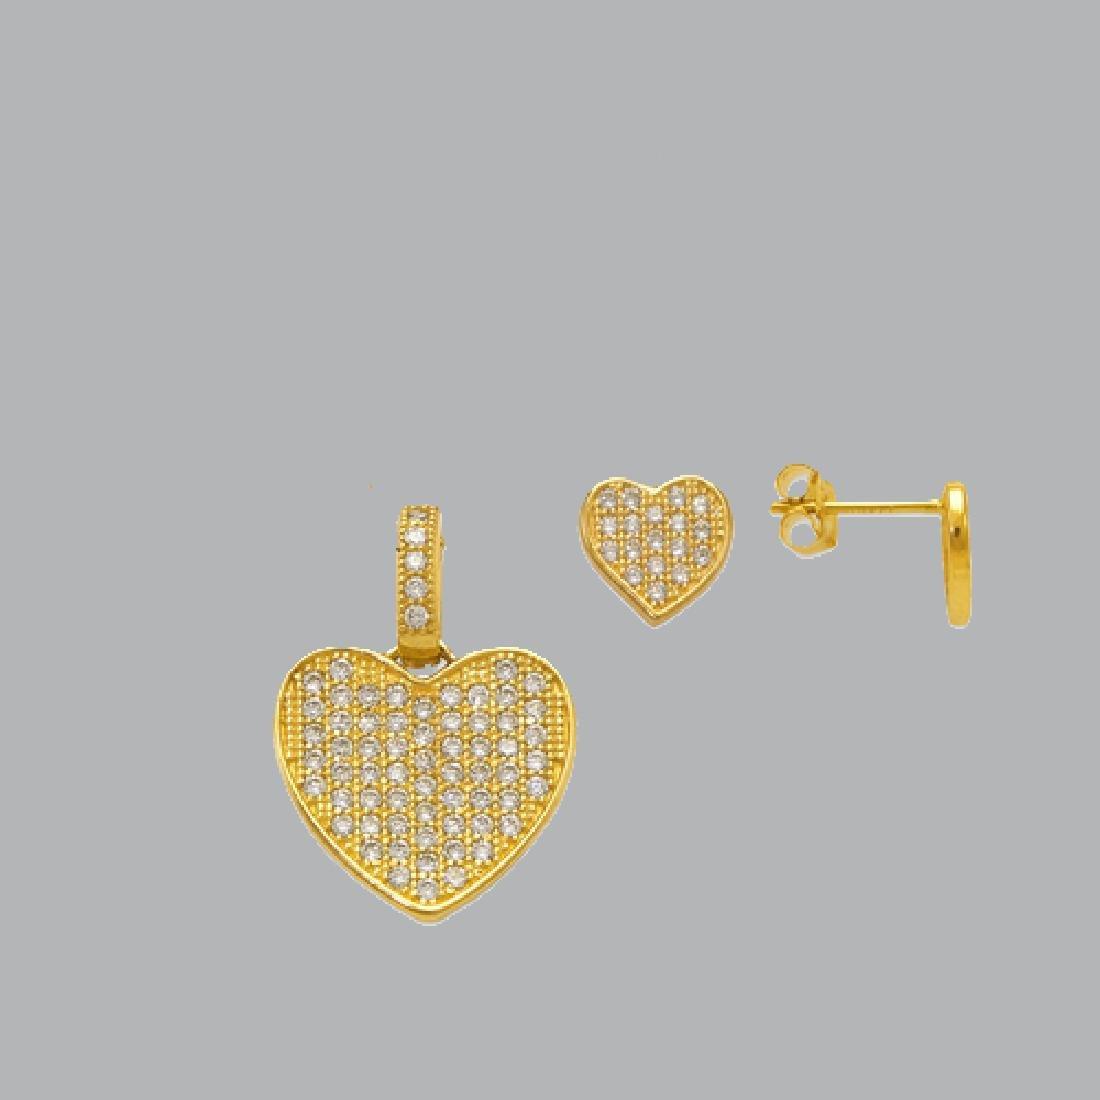 NEW 14K YELLOW GOLD HEART EARRING PENDANT SET - 2